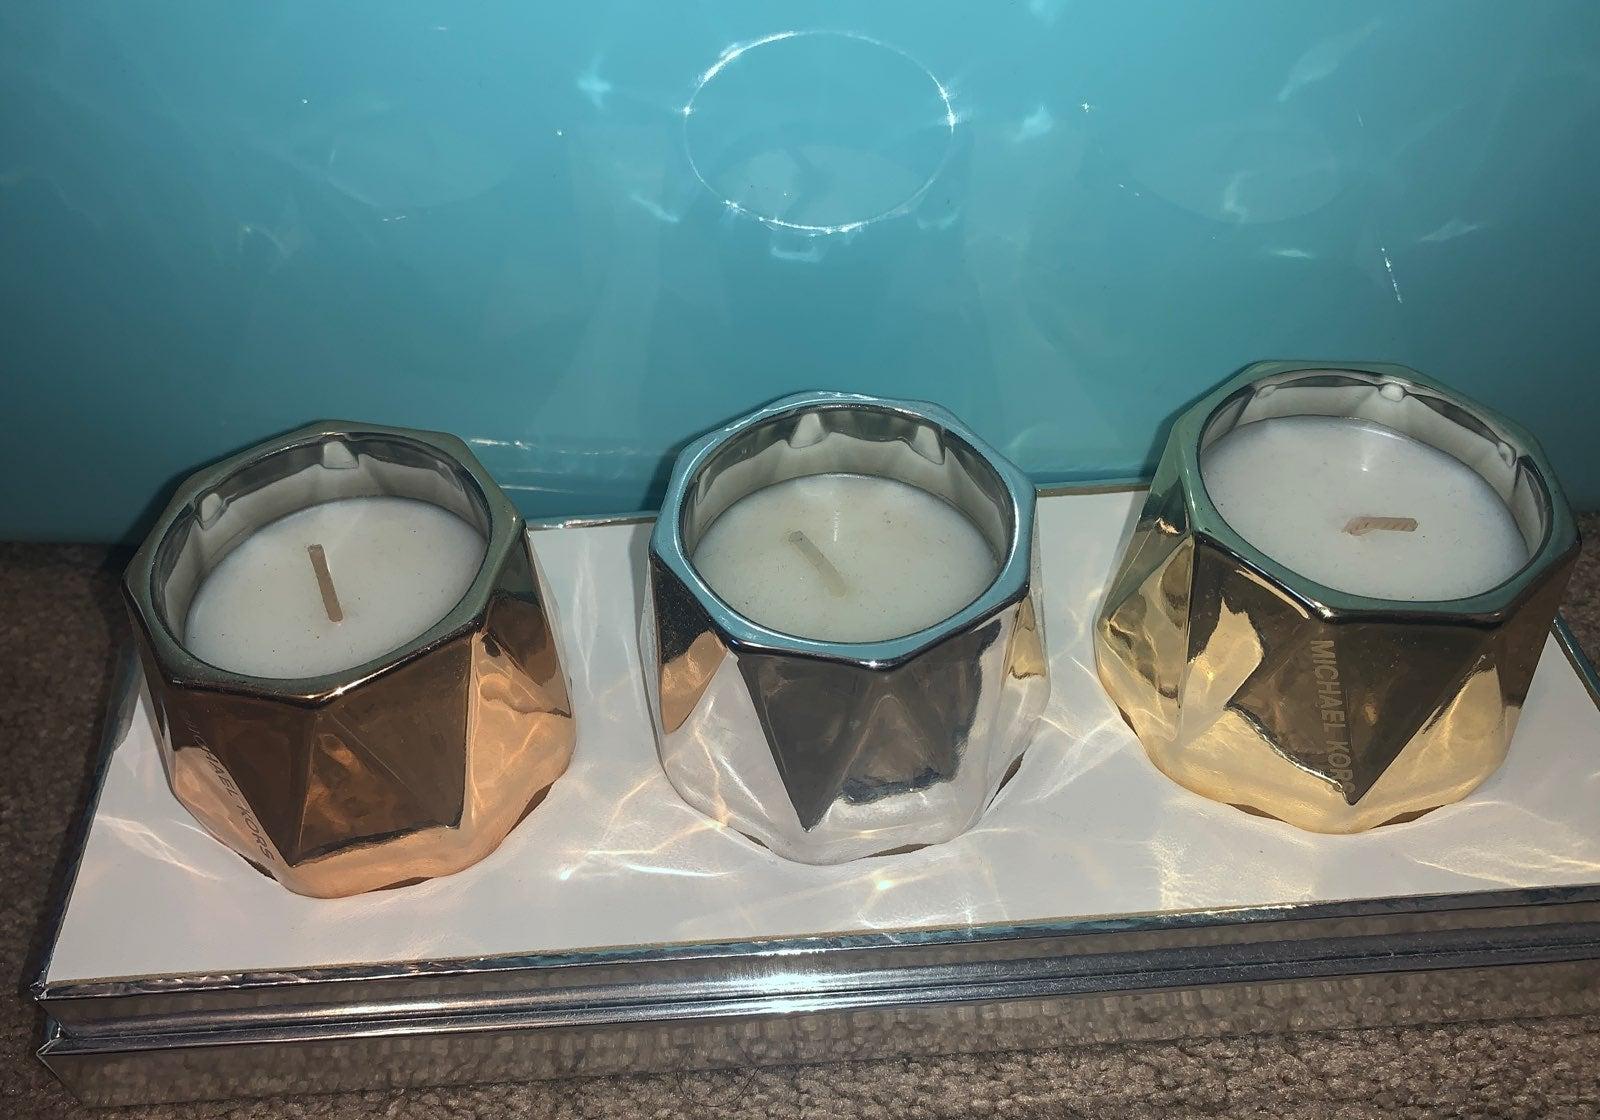 Micheal Kors candle set